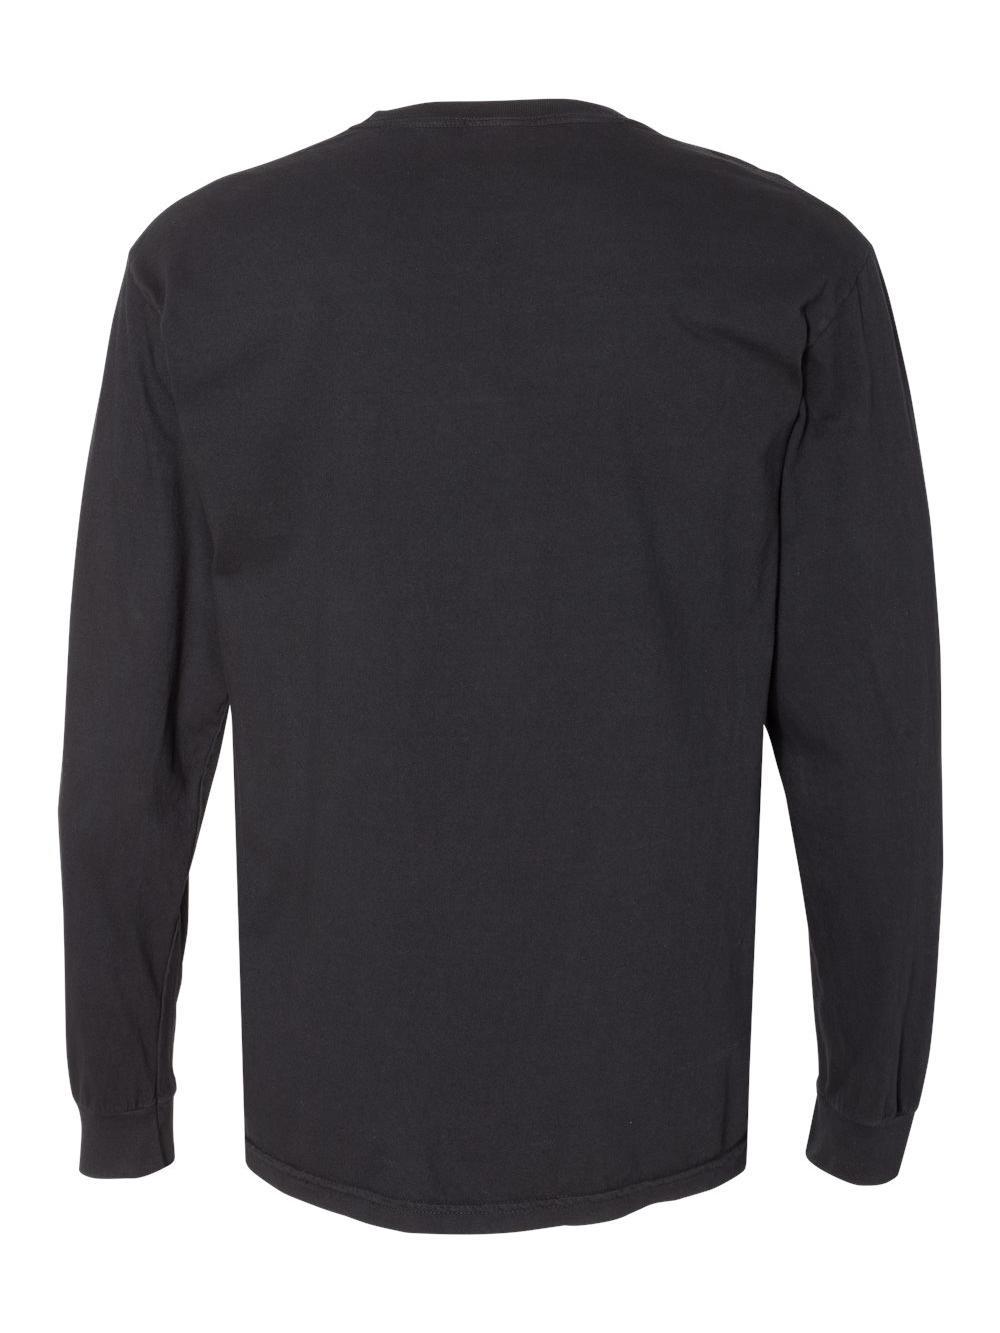 Comfort-Colors-Garment-Dyed-Heavyweight-Ringspun-Long-Sleeve-T-Shirt-6014 thumbnail 7